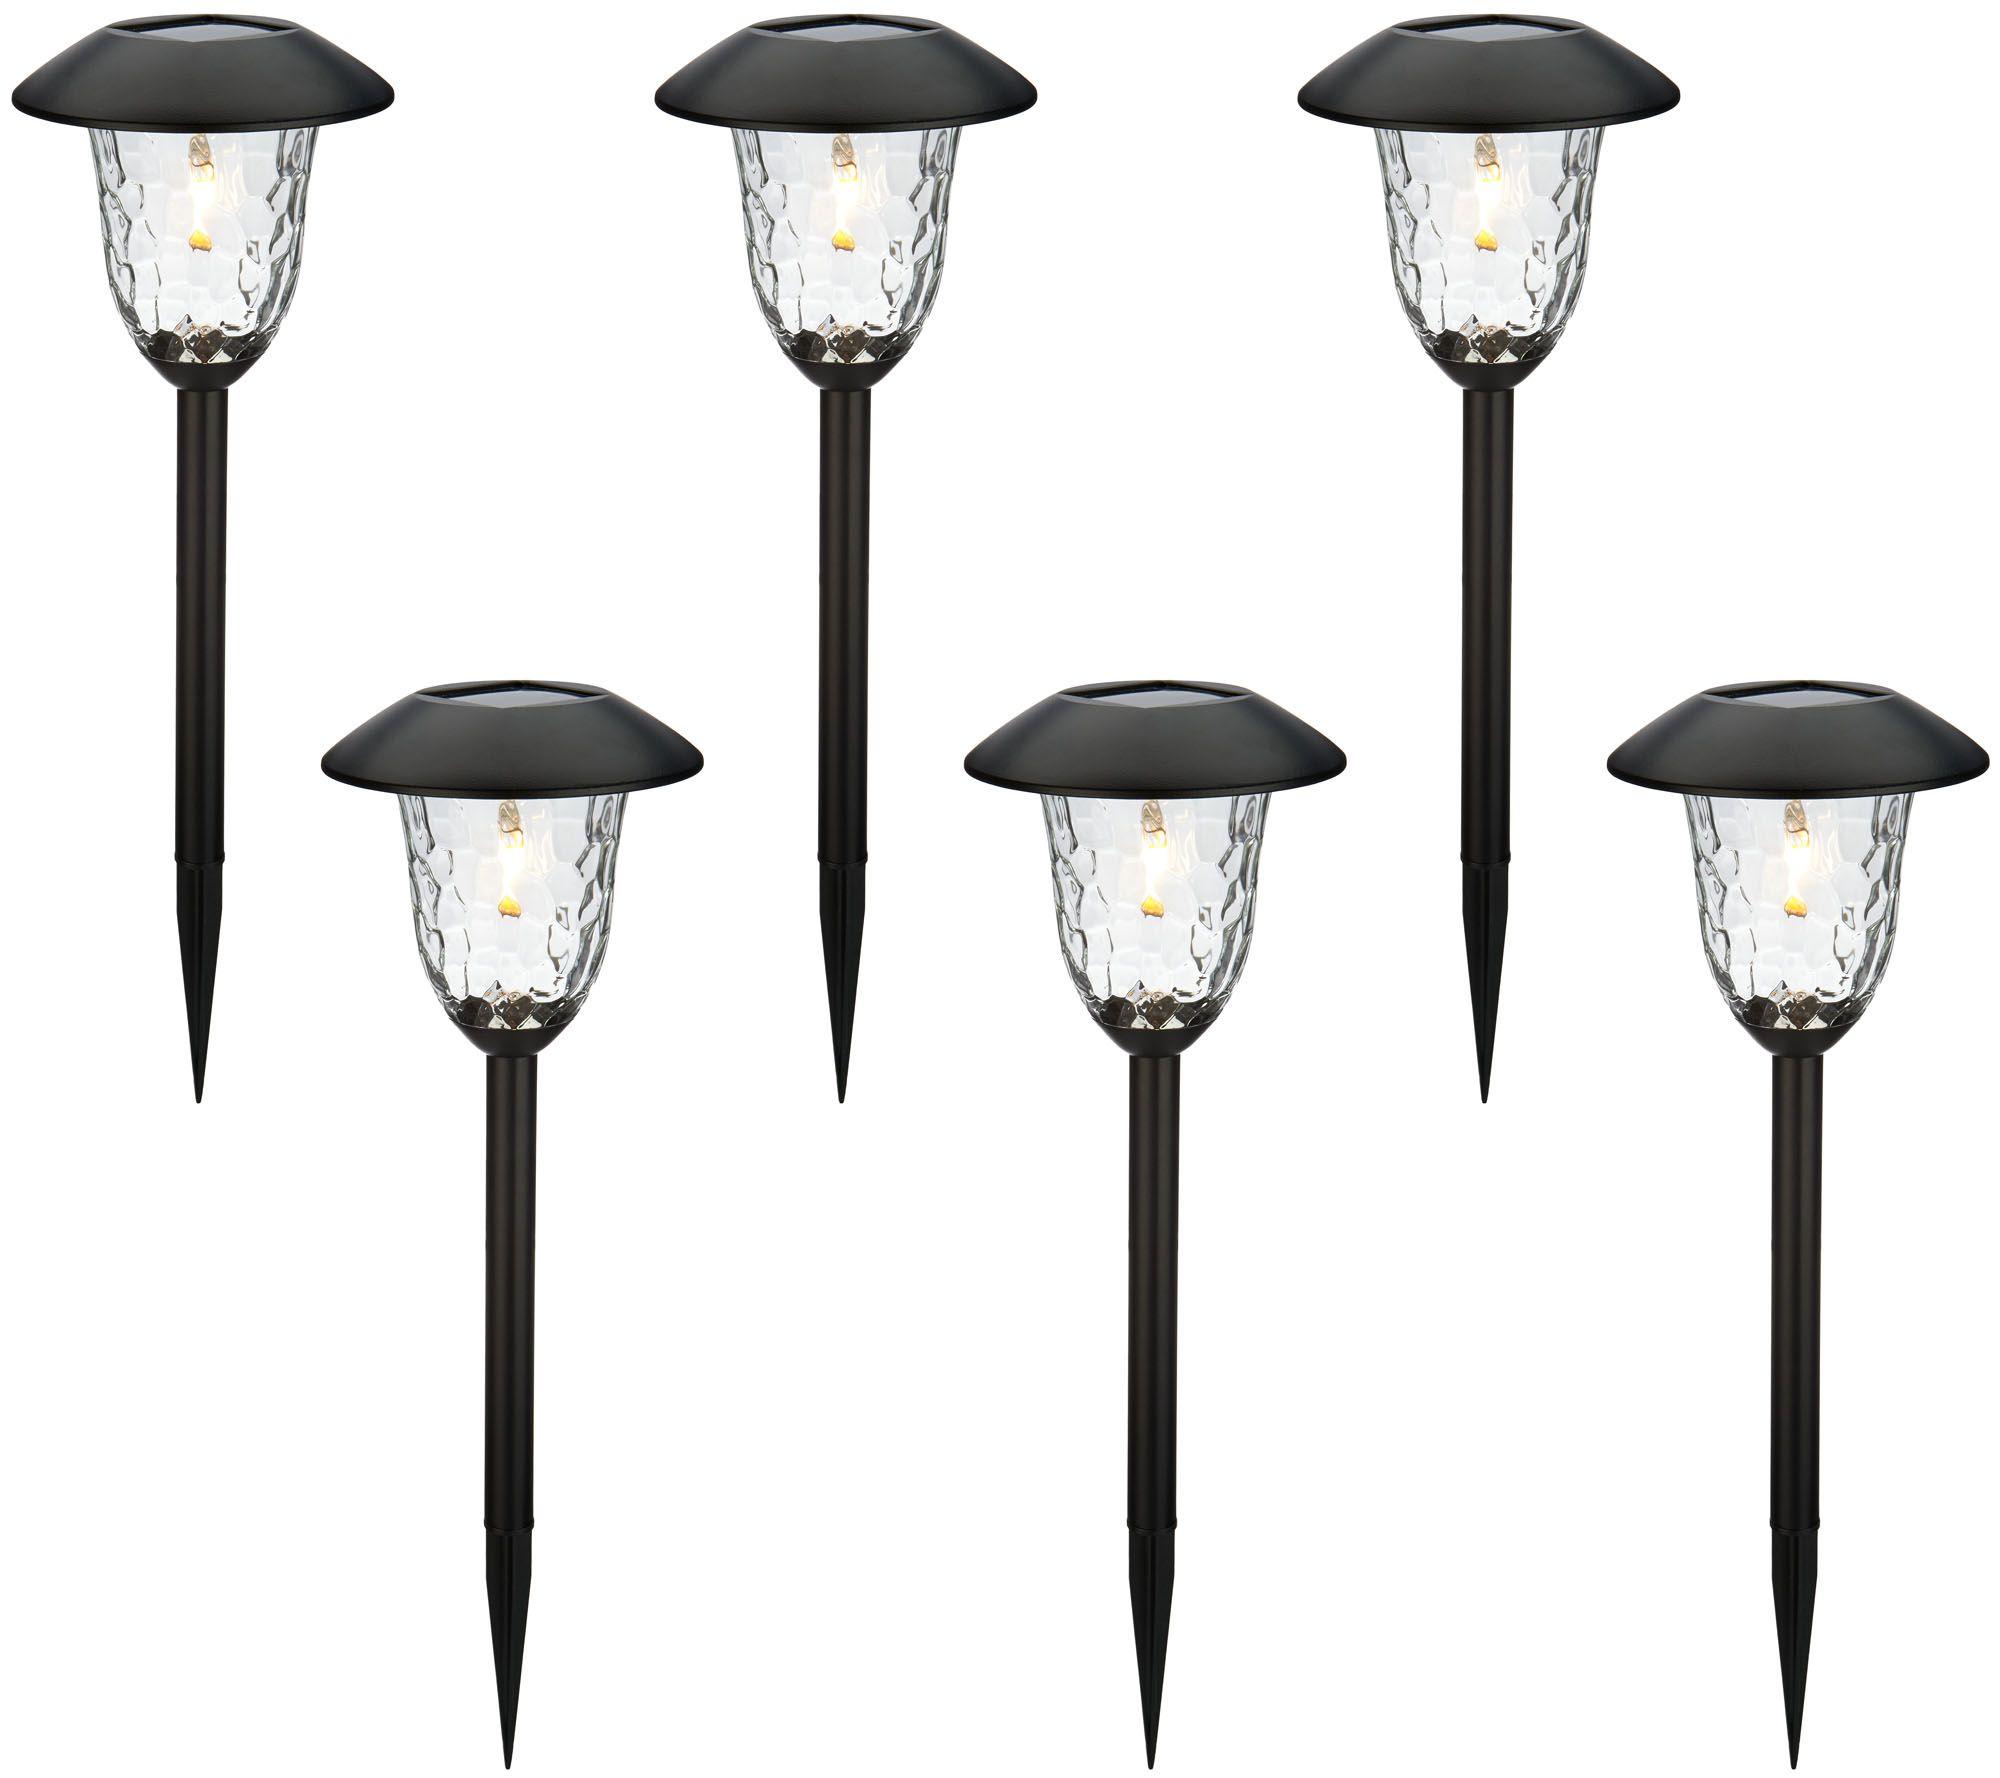 Qvc Outdoor Wall Lights: Paradise Set Of 6 V-Filament Solar Light Set